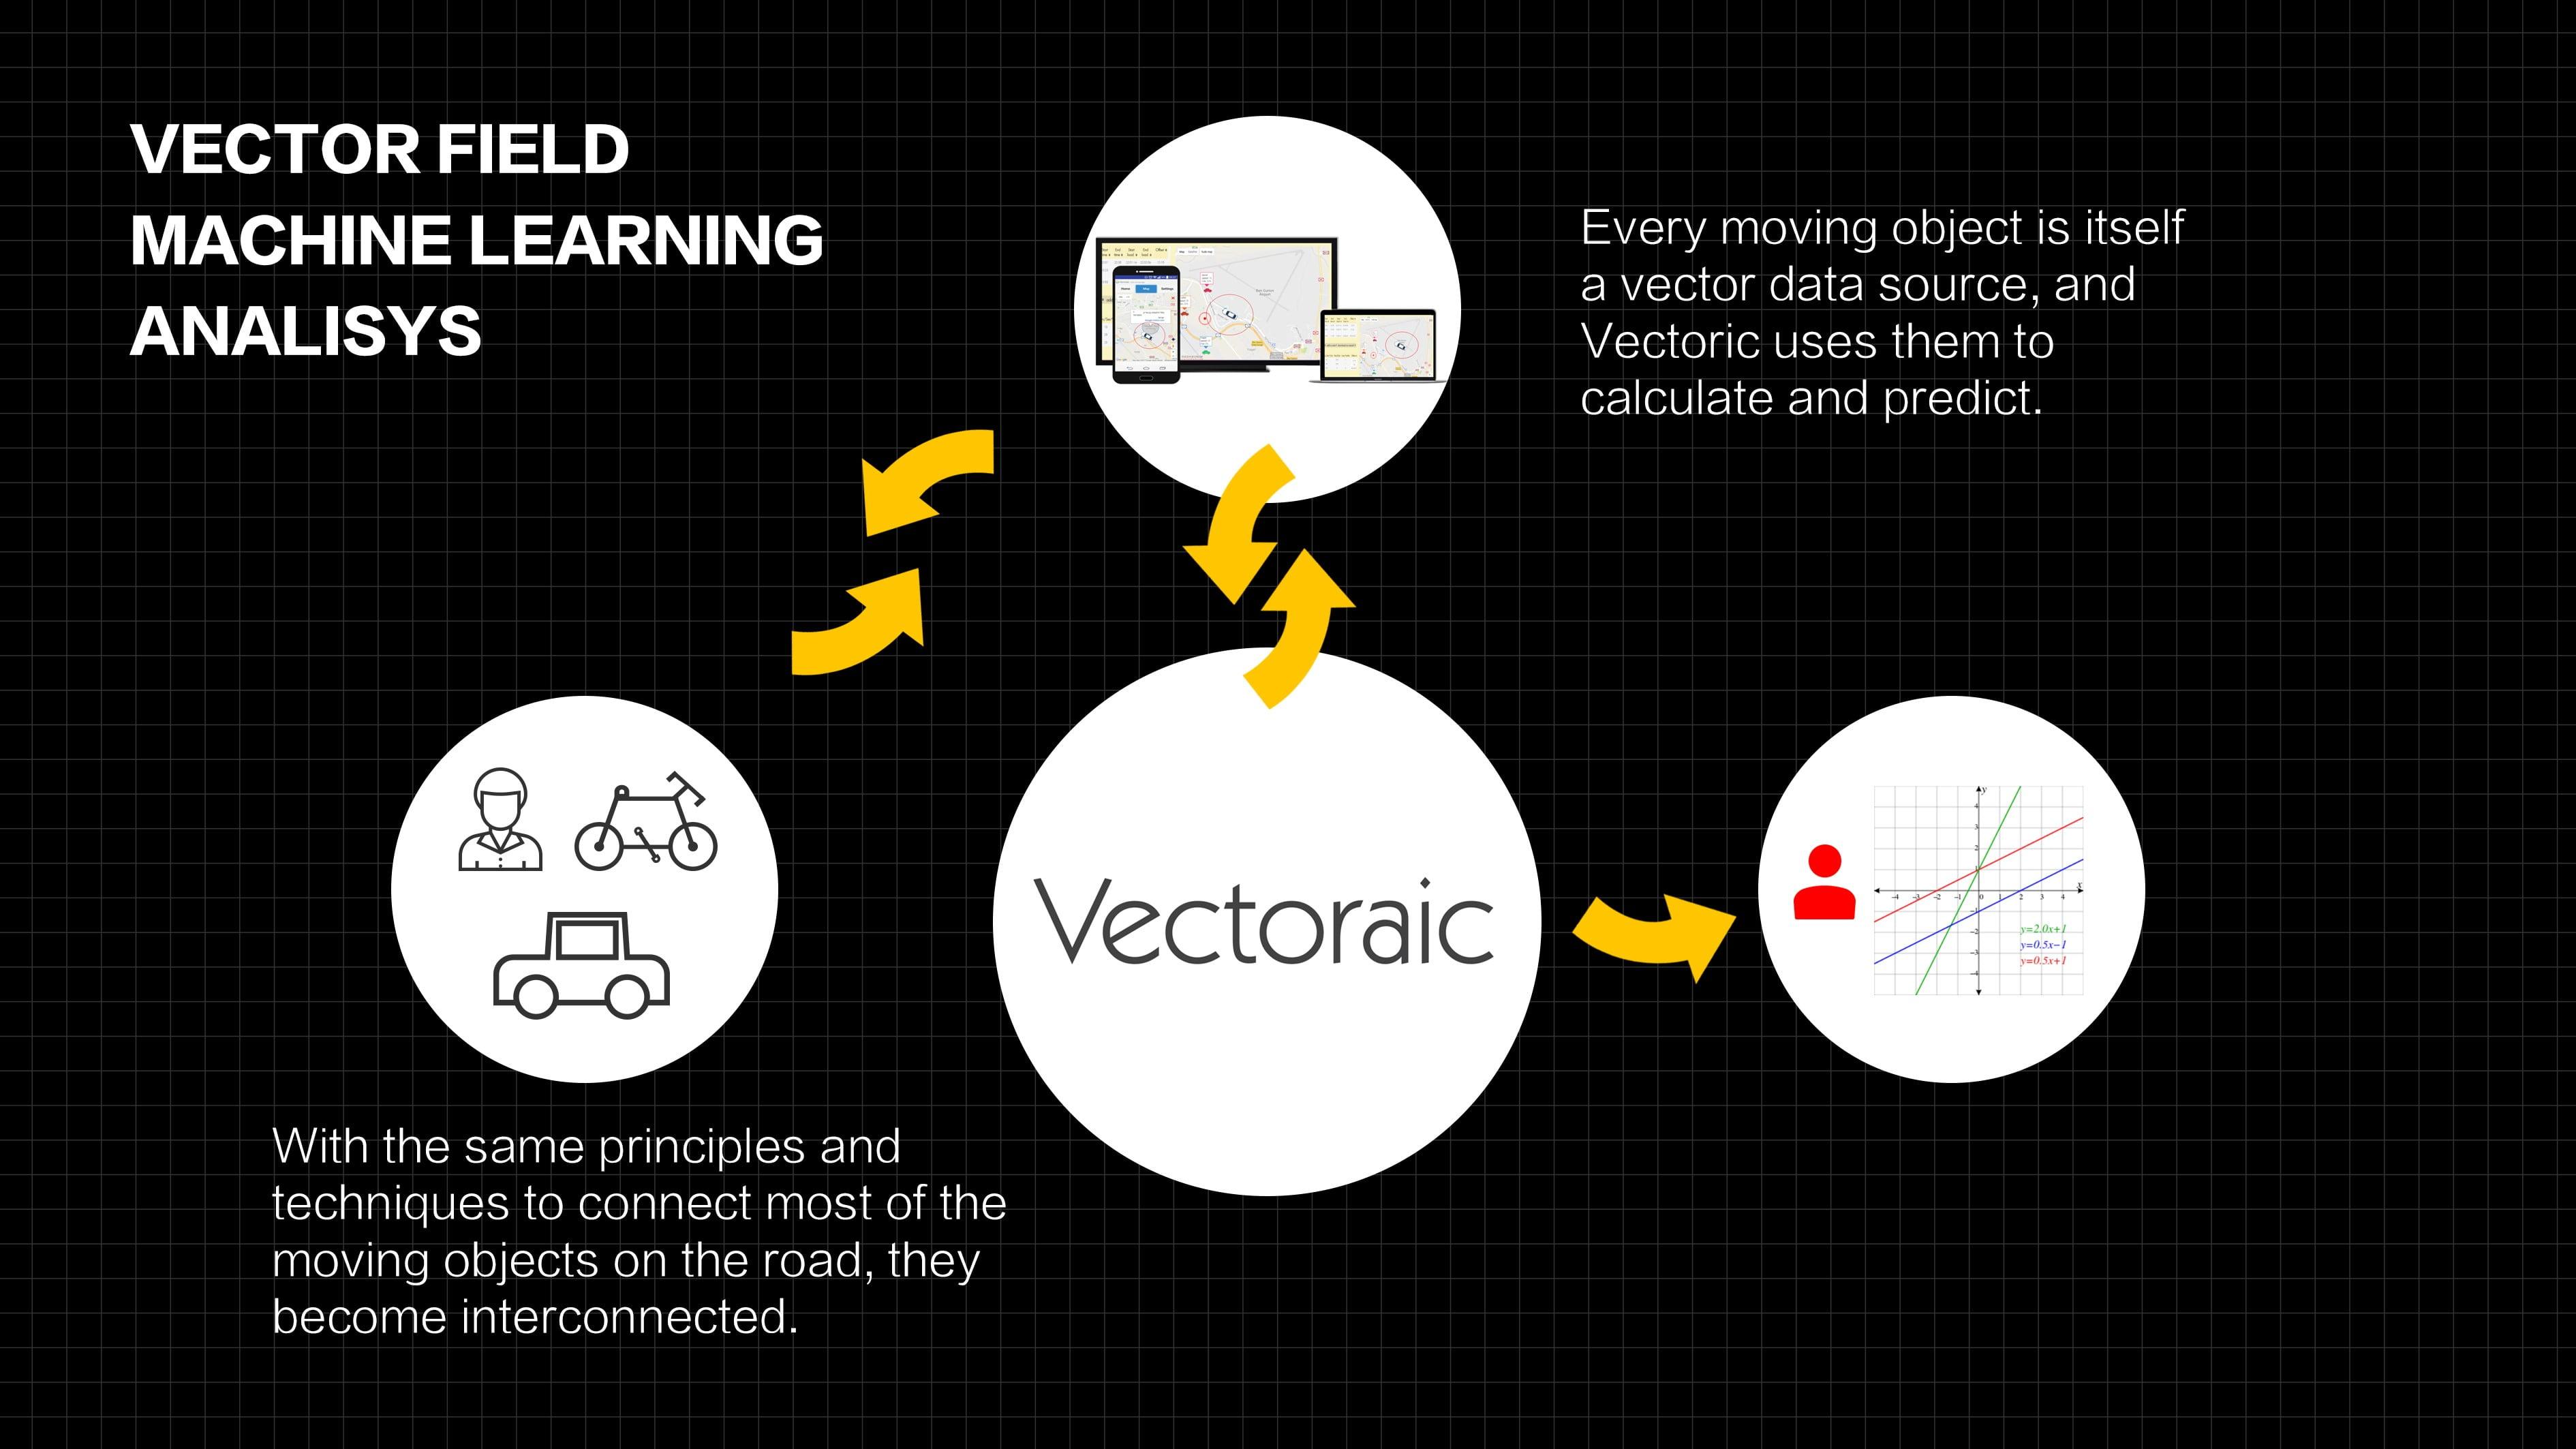 Vectoraic